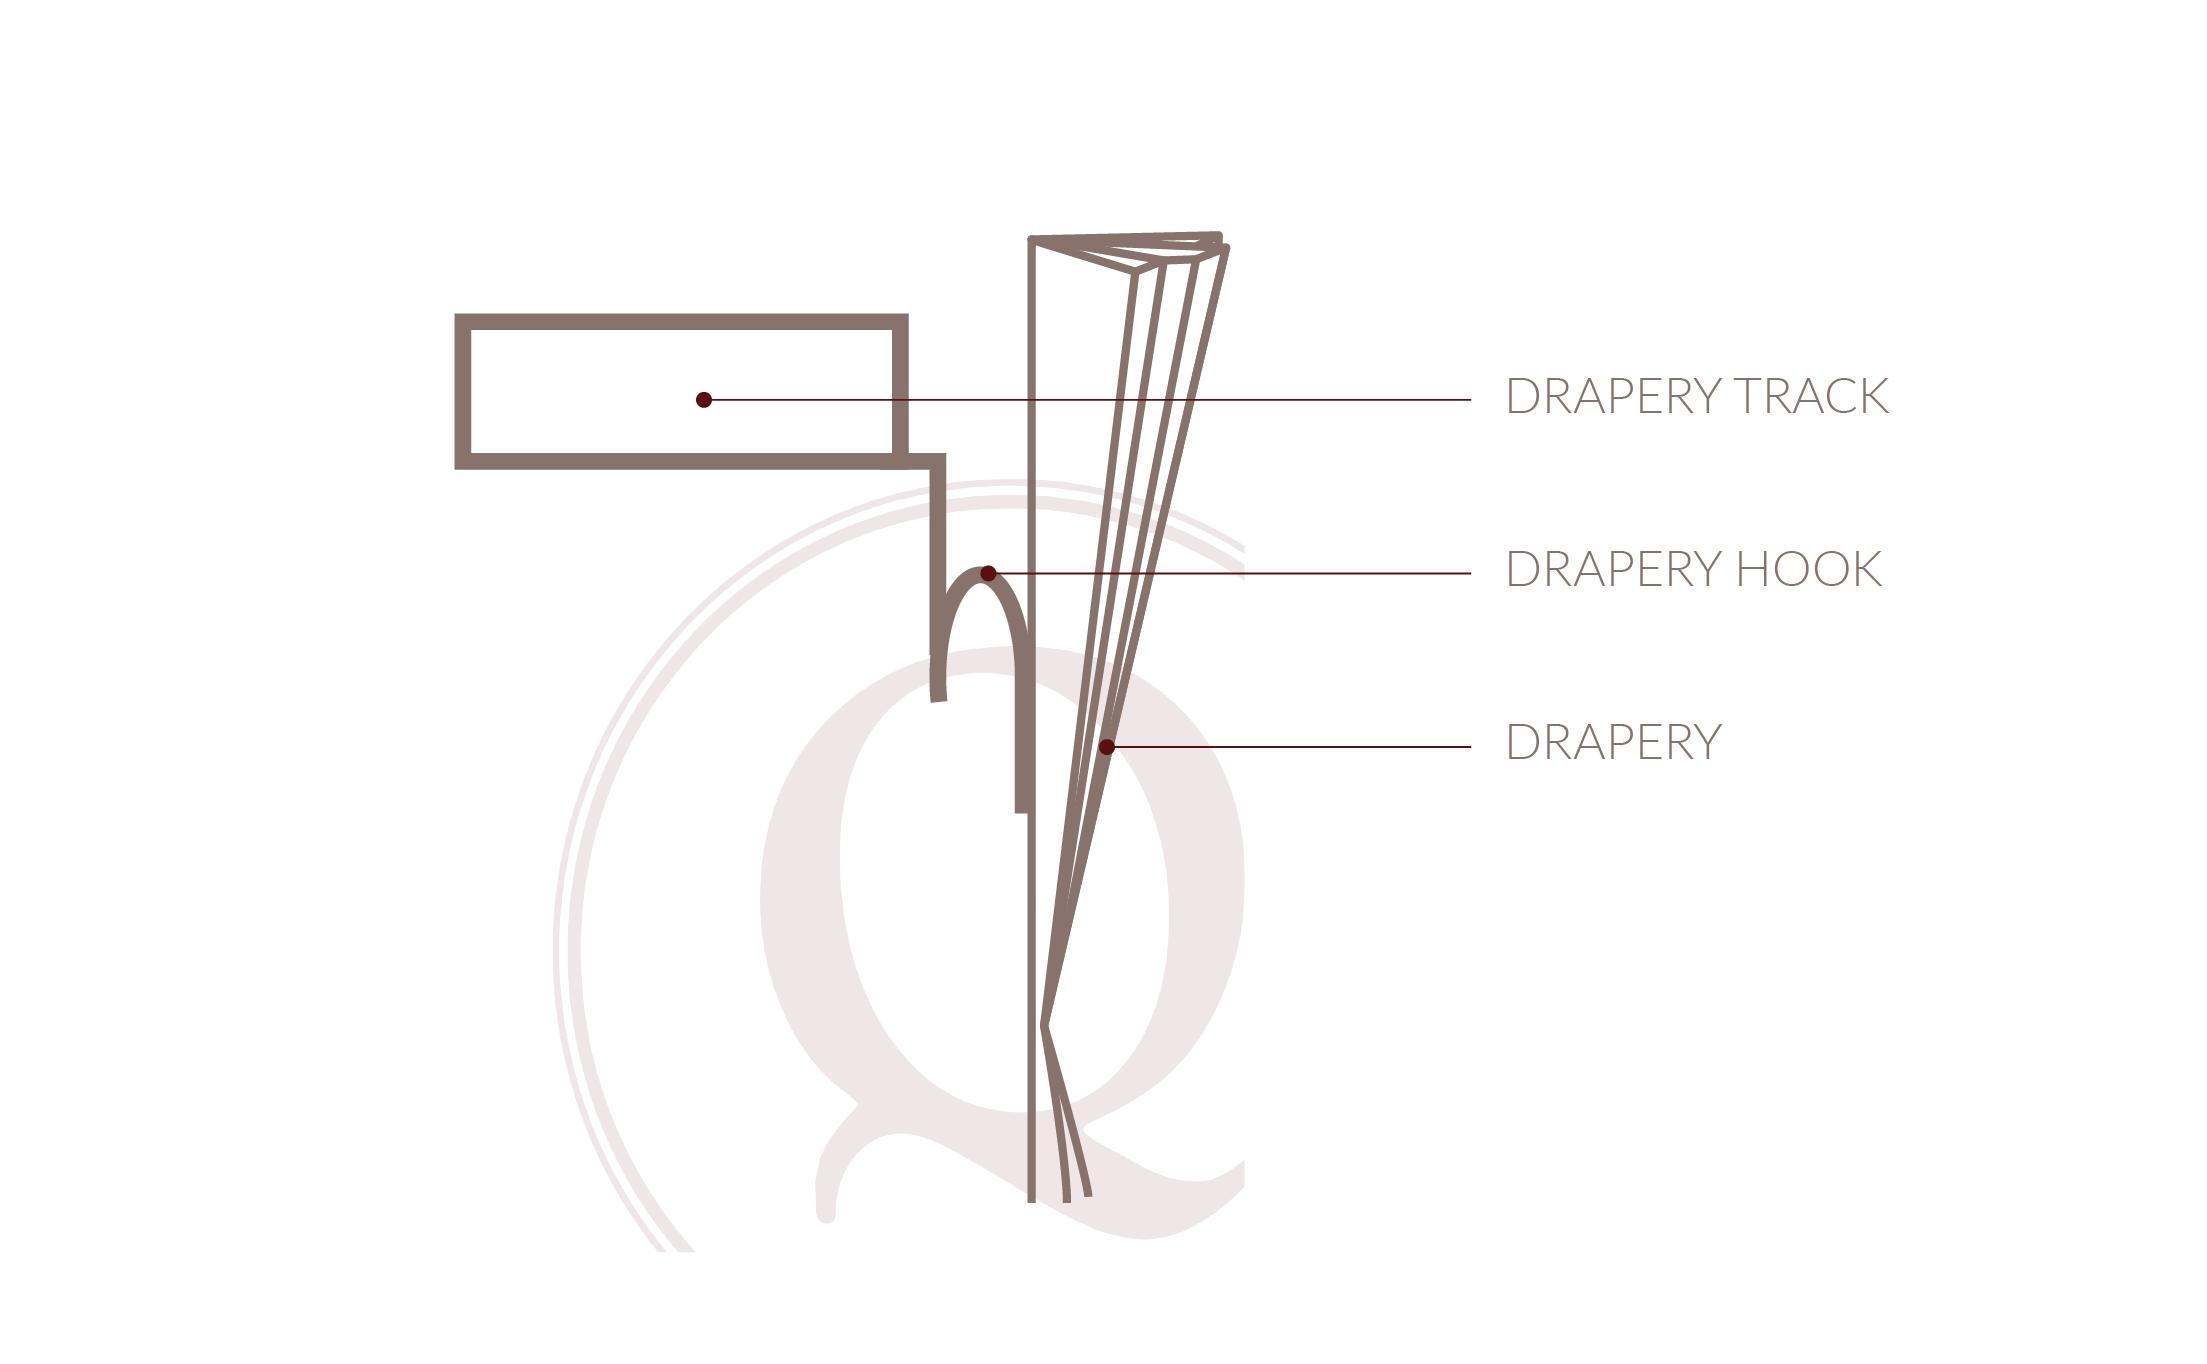 Pinch Pleat Drapery Profile